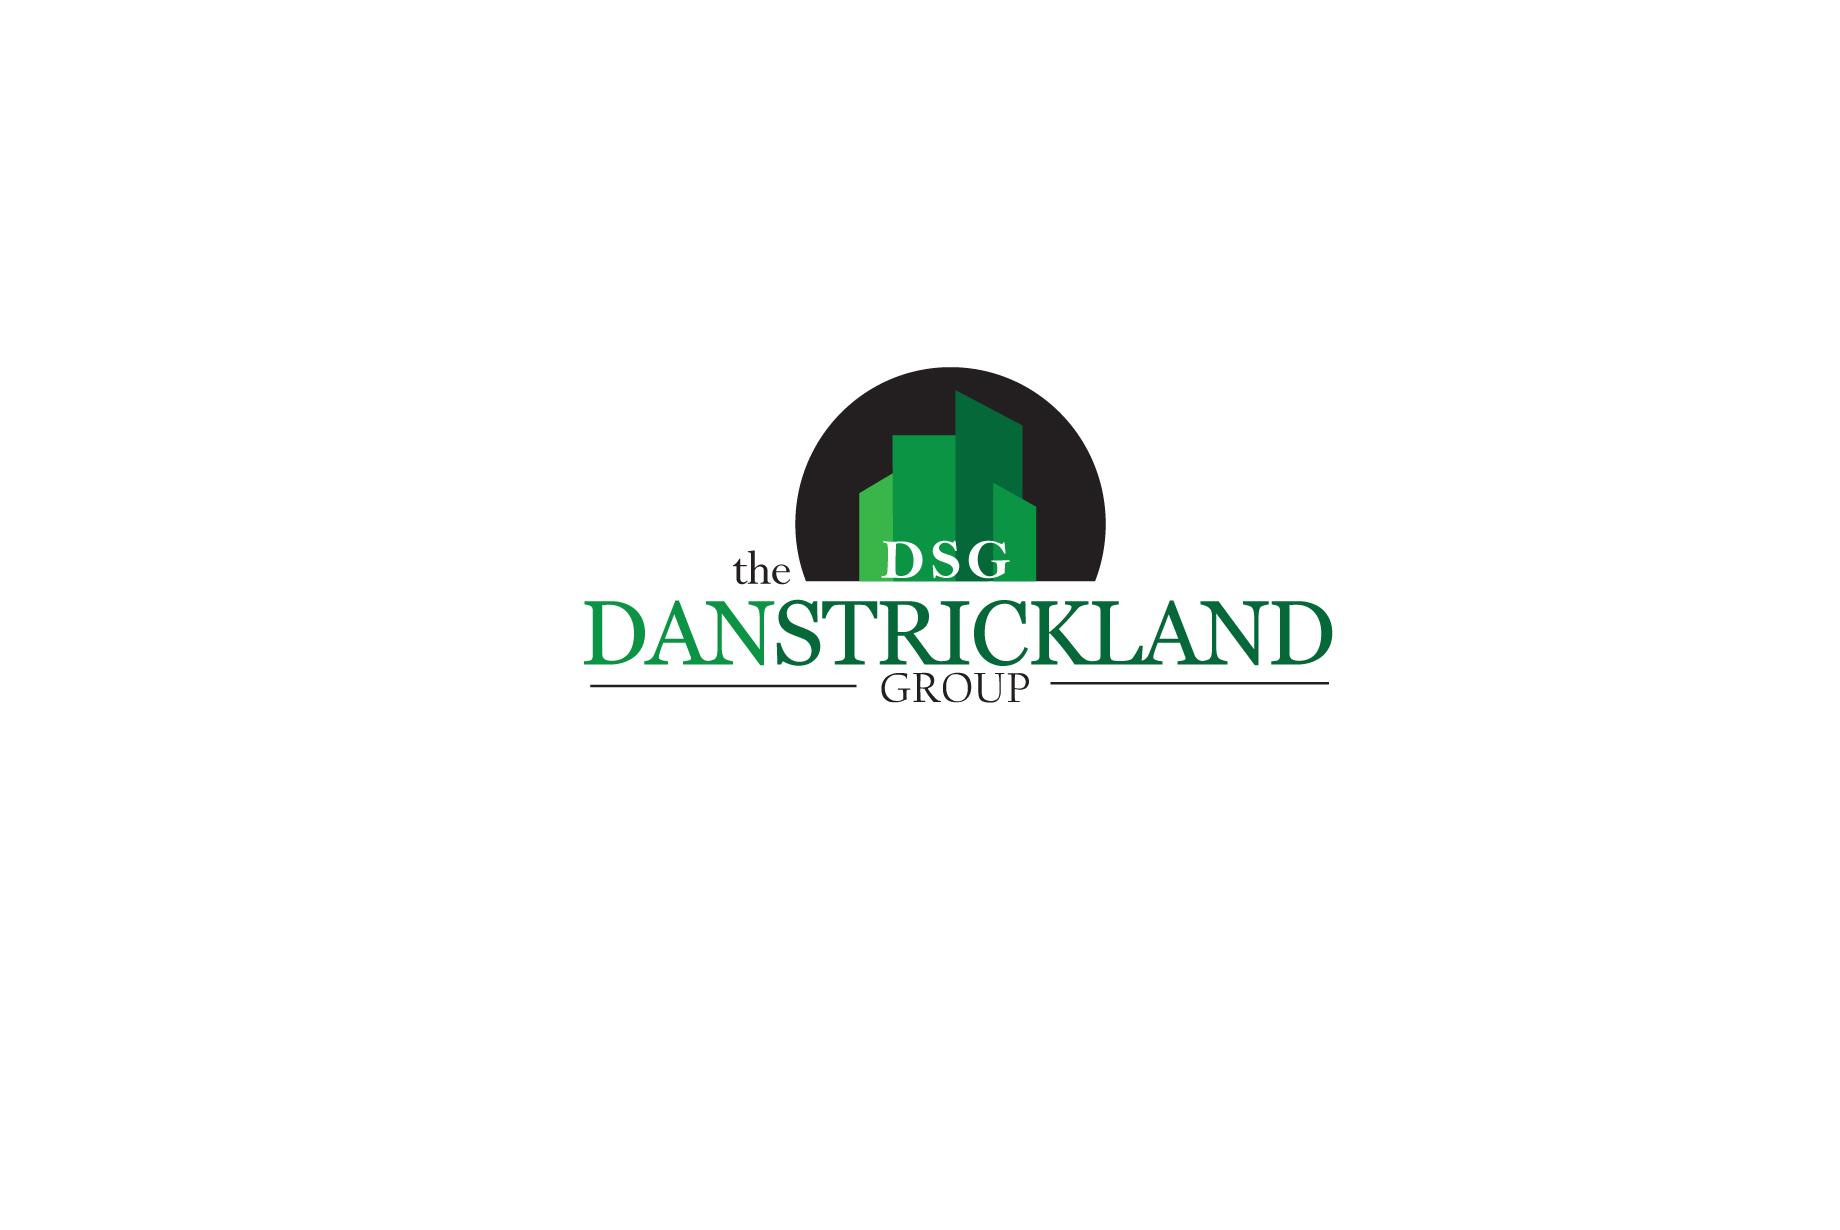 Logo Design by Jan Chua - Entry No. 43 in the Logo Design Contest Creative Logo Design for The Dan Strickland Group.